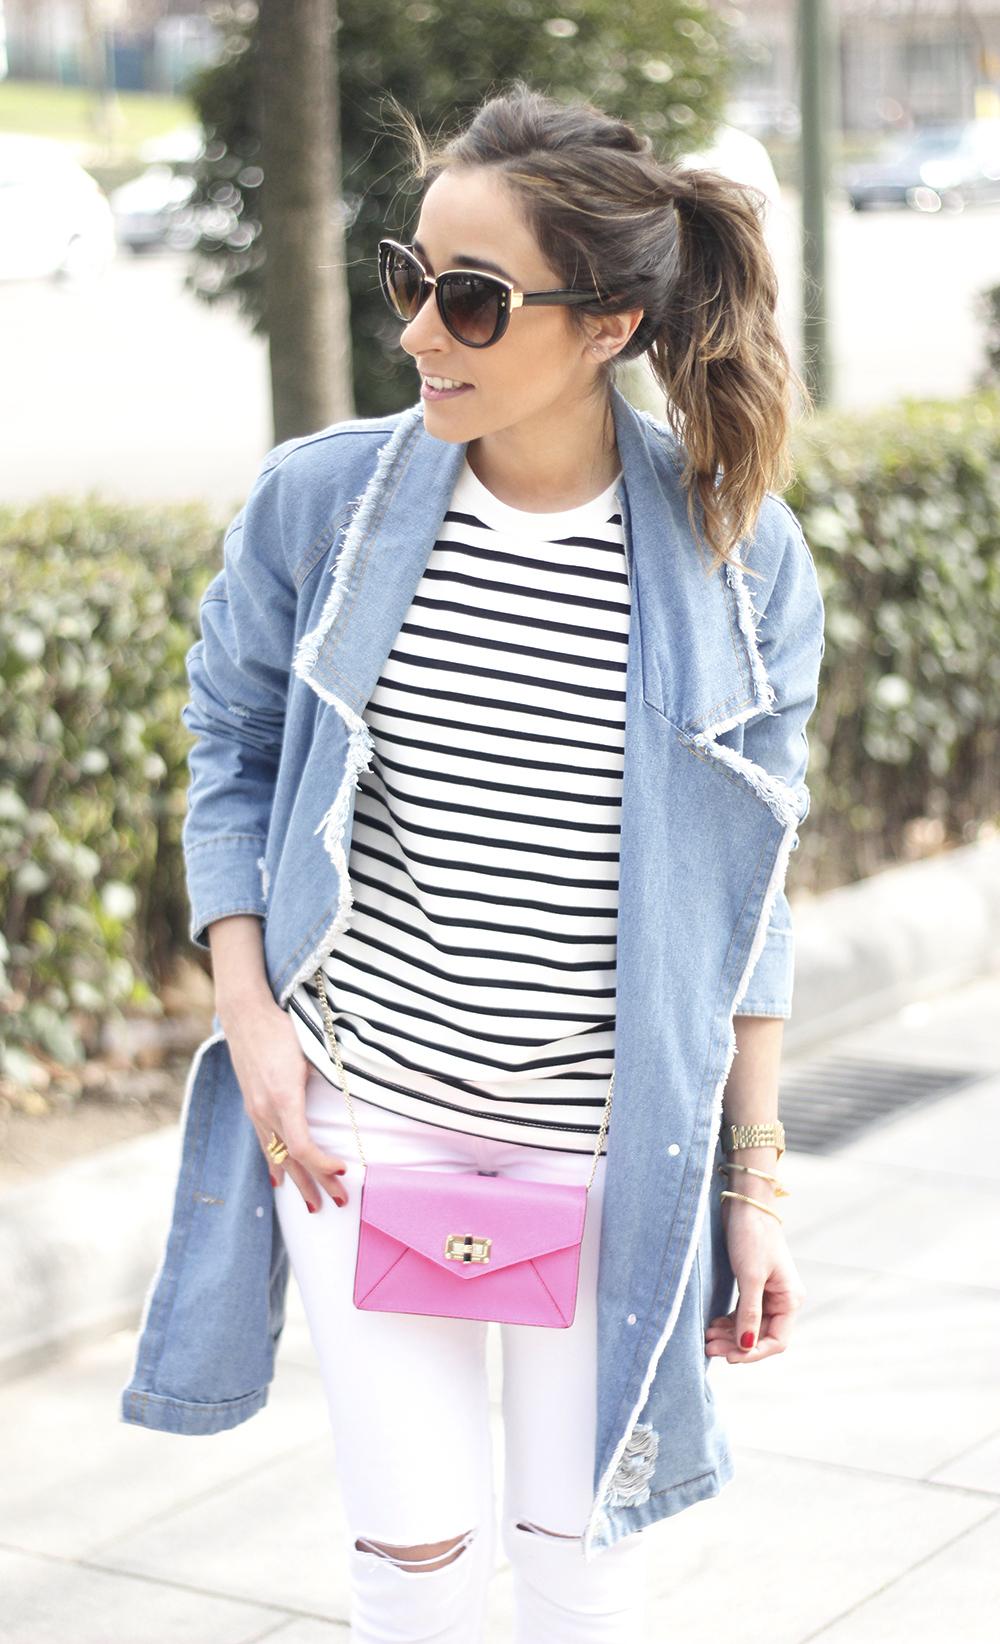 Stripes and Denim Coat Gloria Ortiz Heels Accessories Sunnies Outfit02